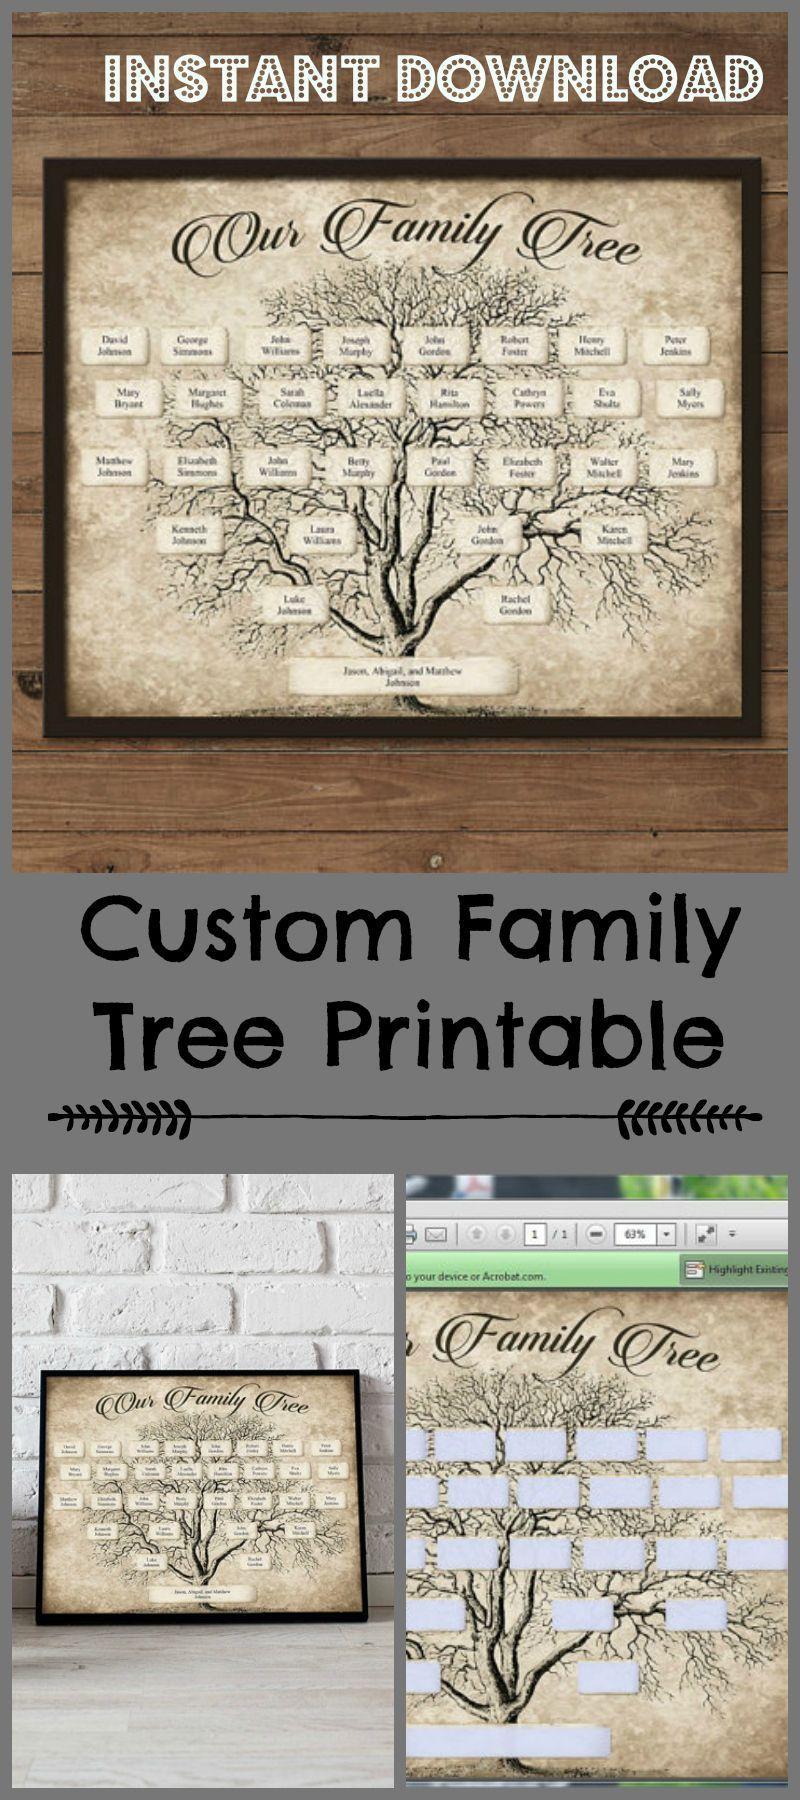 003 Stupendou Family Tree Book Template Sample  Photo FreeFull